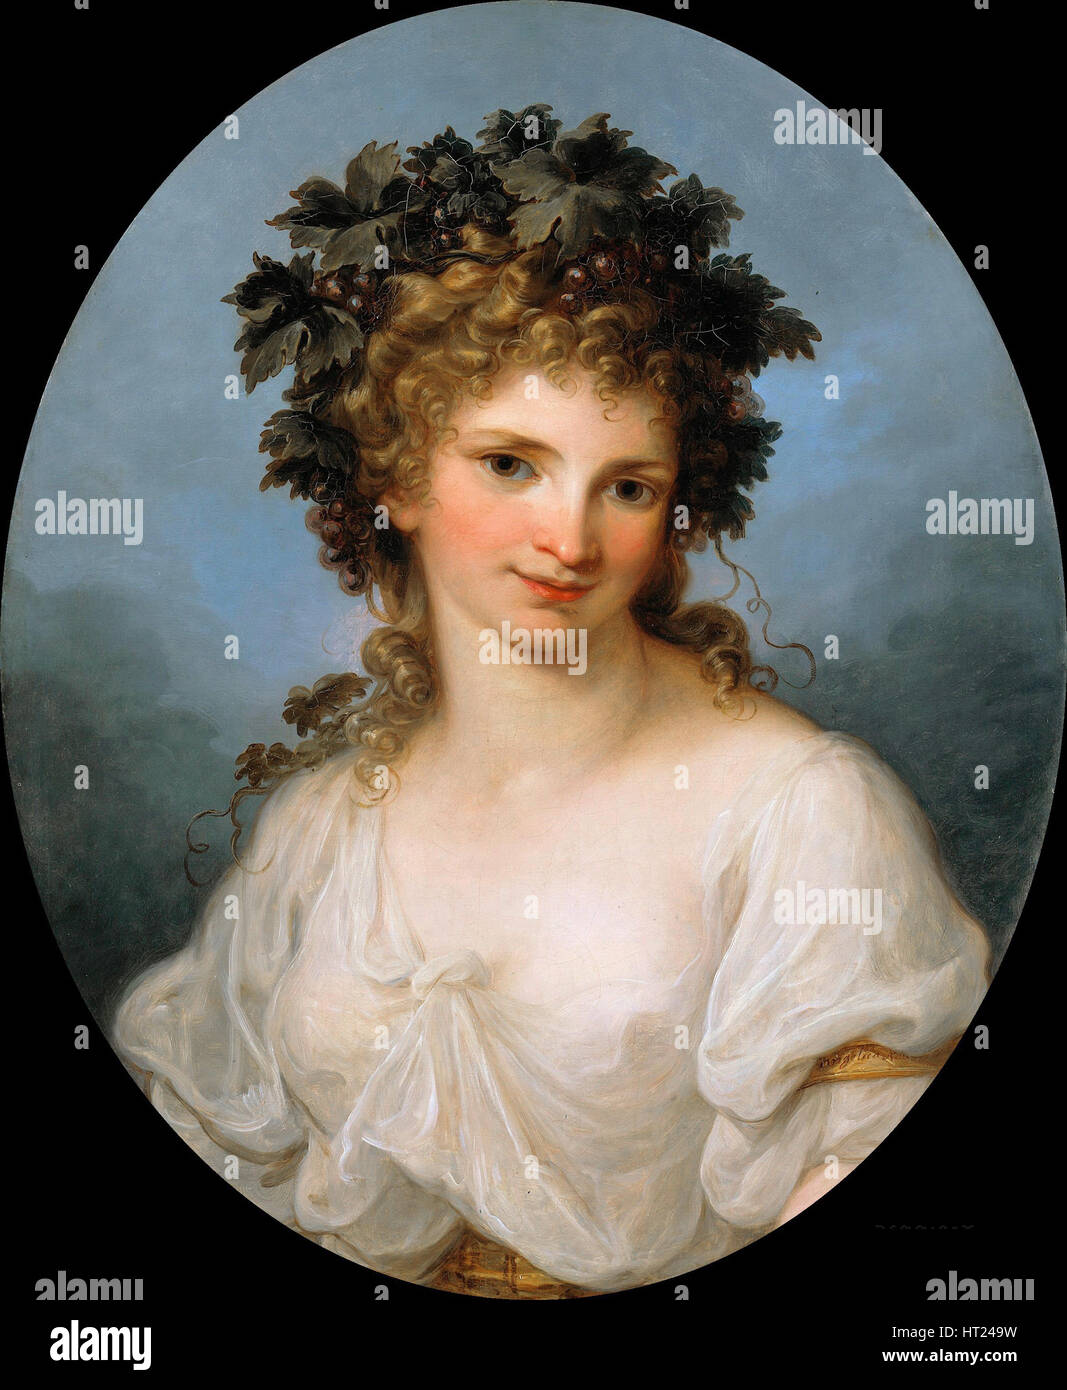 Self-portrait as Bacchante, before 1786. Artist: Kauffmann, Angelika (1741-1807) Stock Photo